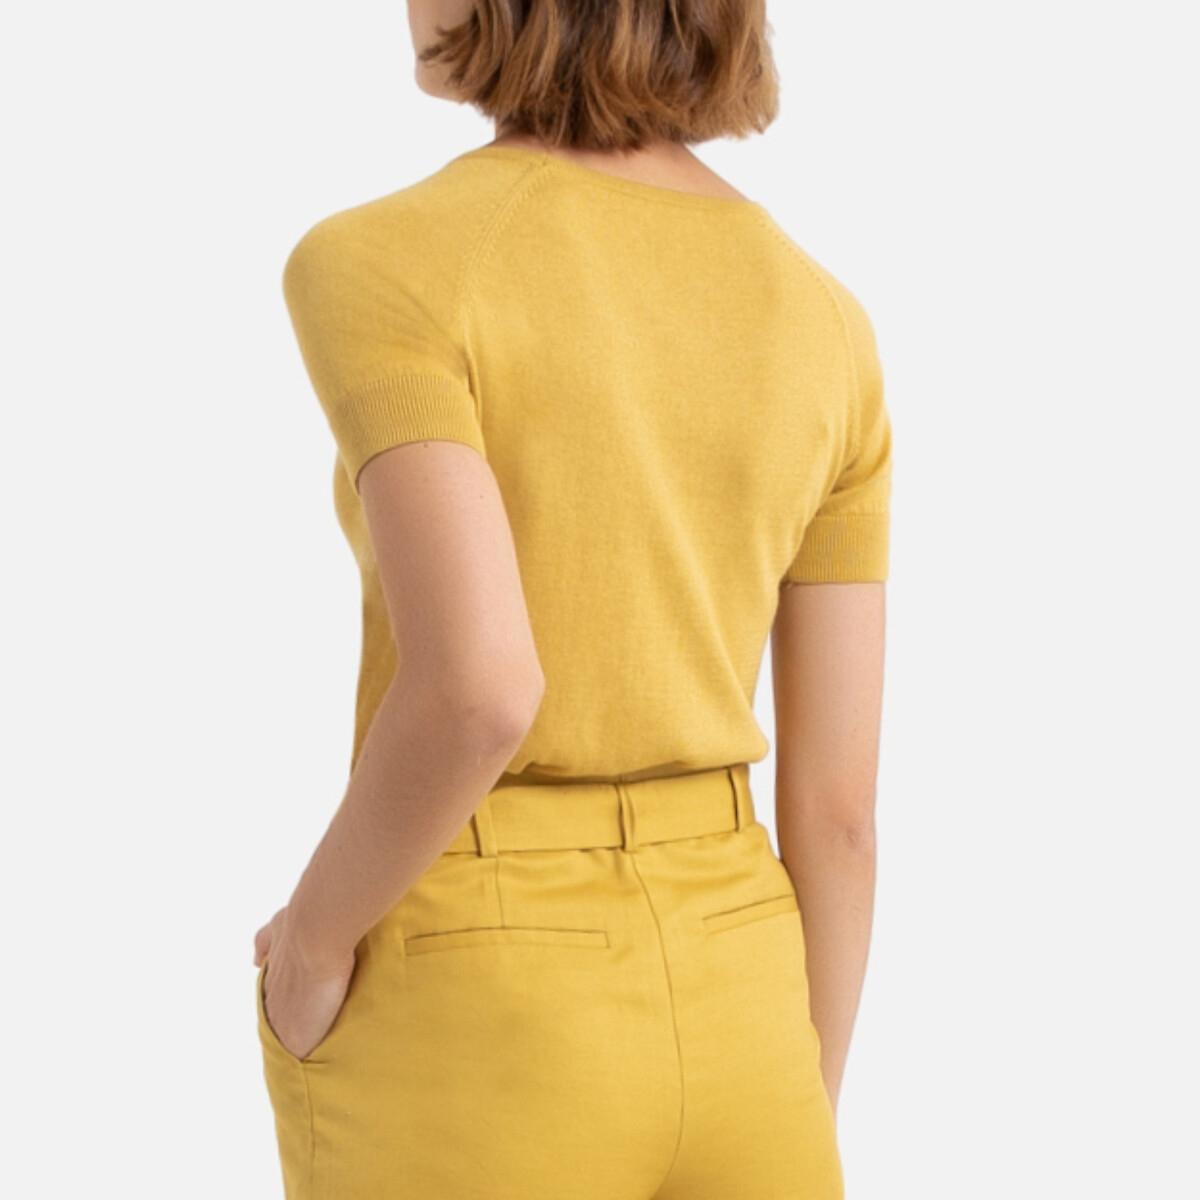 Jersey de manga corta, de punto fino